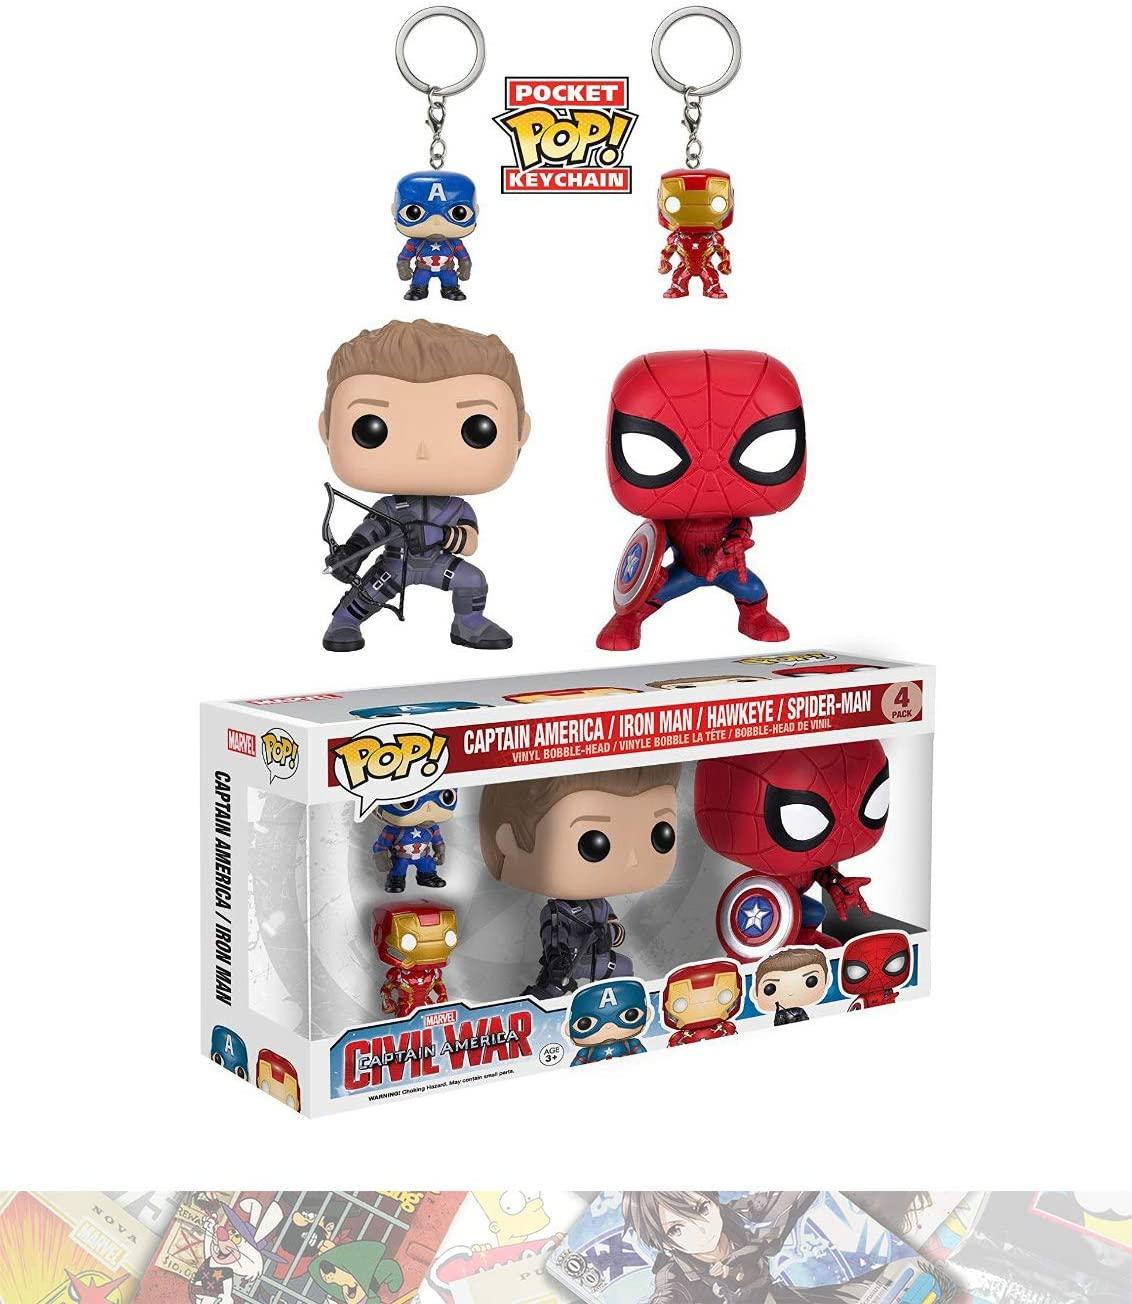 Captain America, Iron Man, Hawkeye, Spider-Man: Funko POP! & Pocket POP! x Captain America Civil War 4-Figure Pack + 1 FREE Official Marvel Trading Card Bundle (076047)